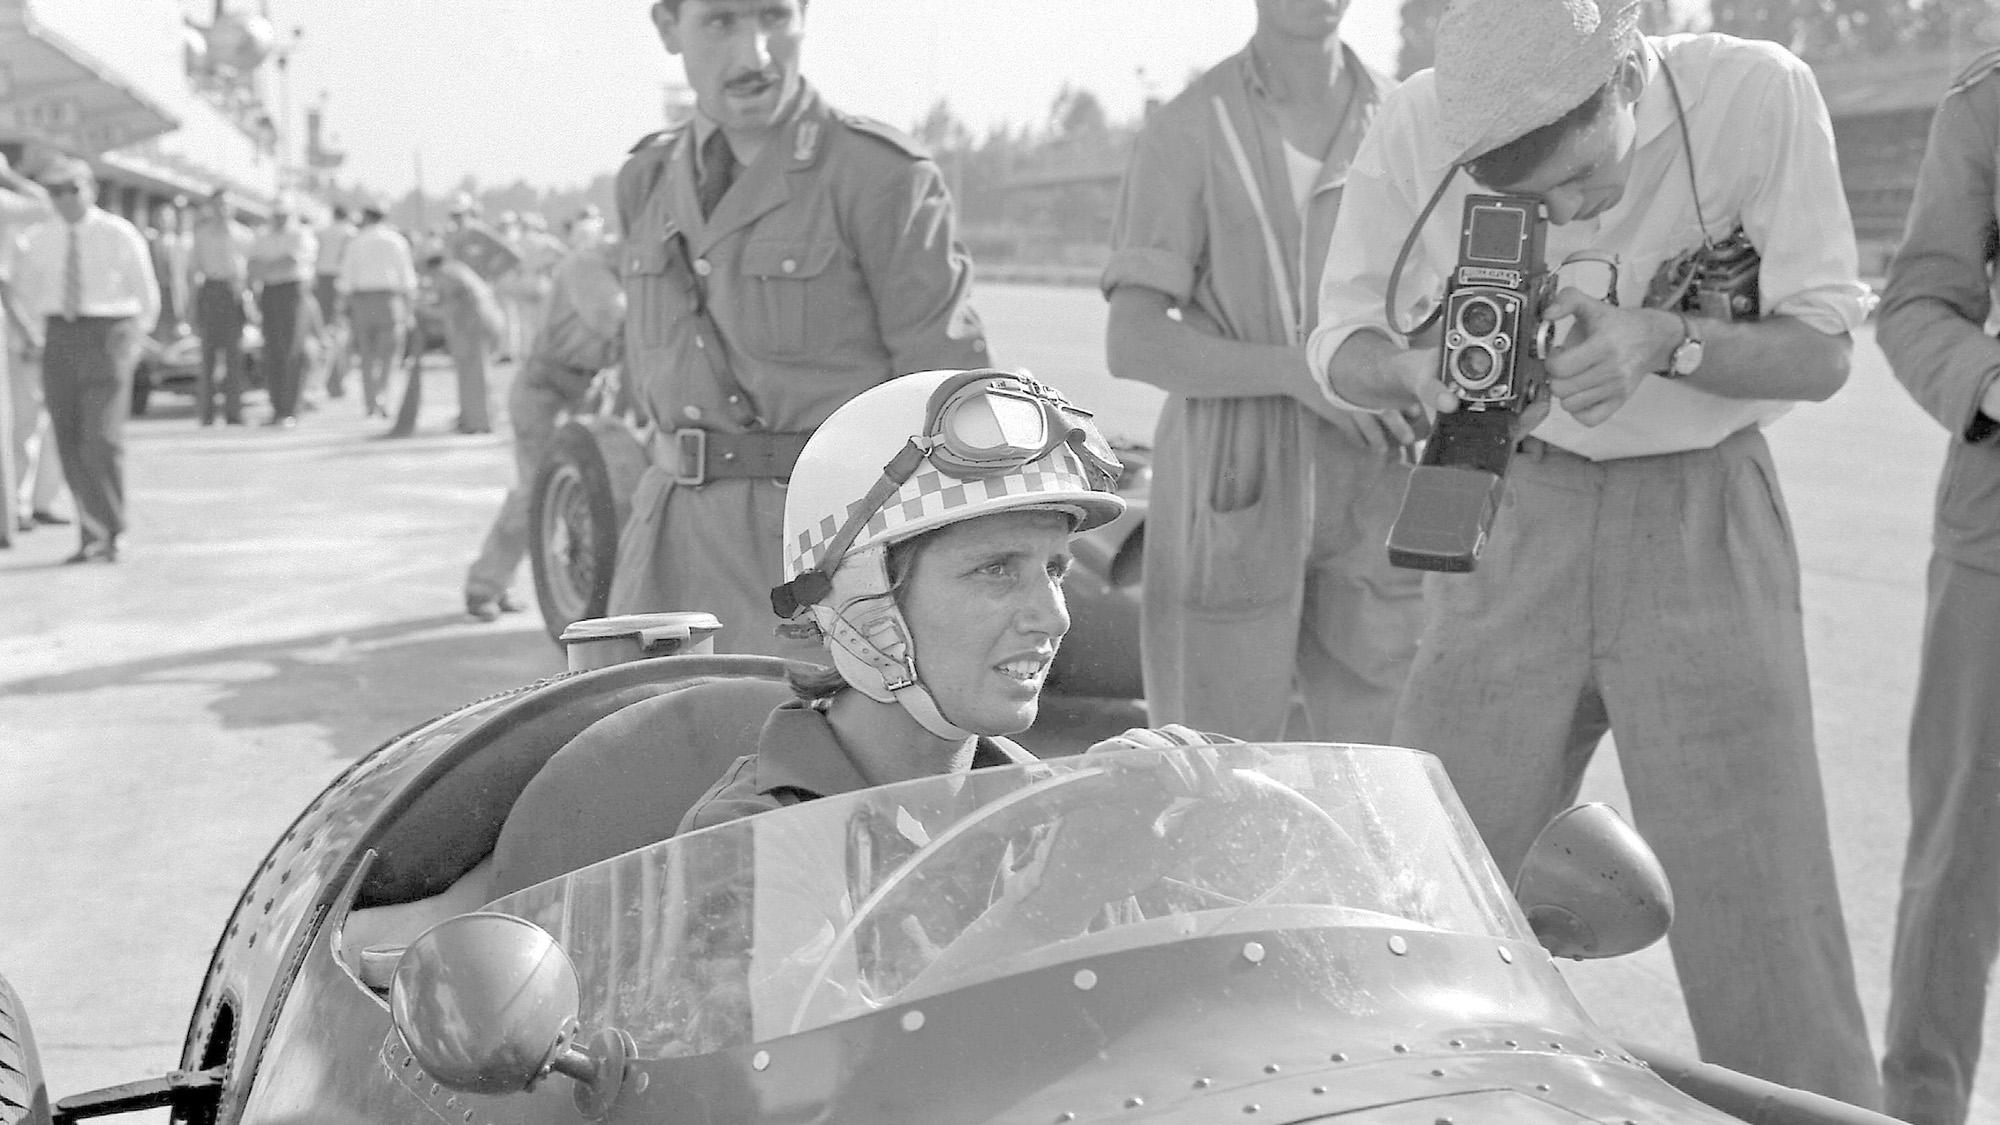 Maria Teresa de Filippis at the wheel of her Maserati ahead of the 1958 F1 Italian Grand Prix at Monza